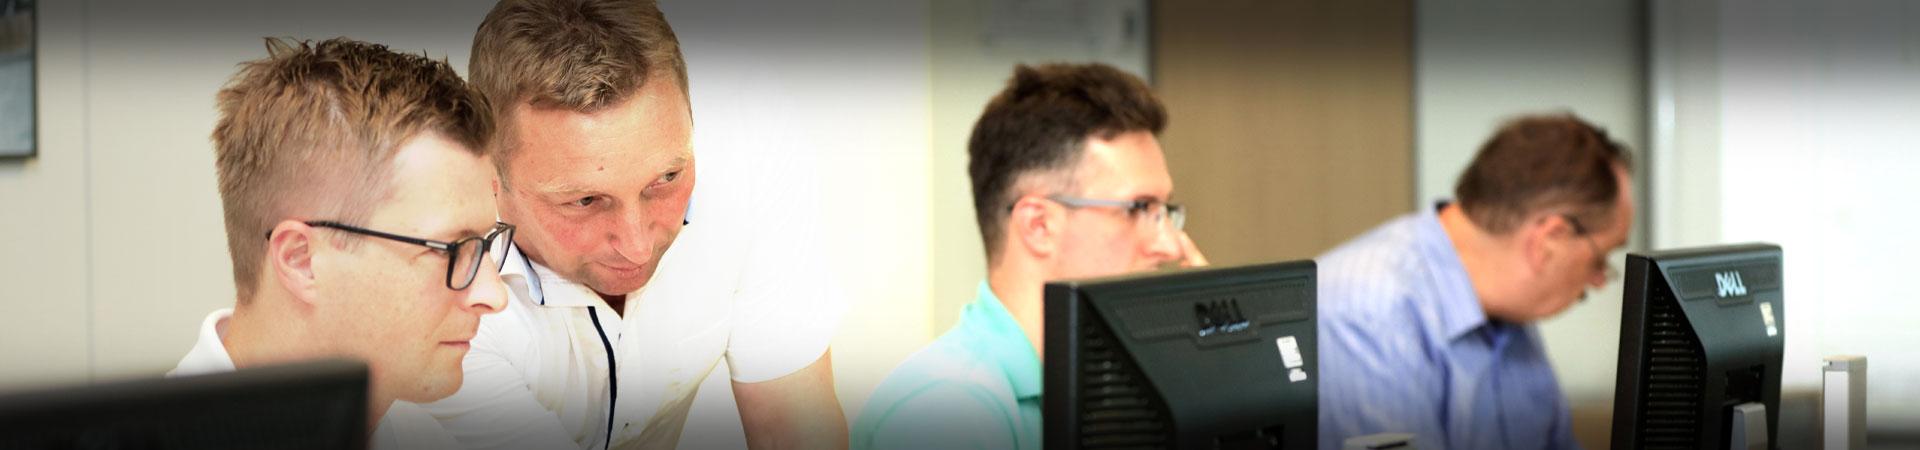 TNC školení HEIDENHAIN – odborné znalosti zaměřené na praxi